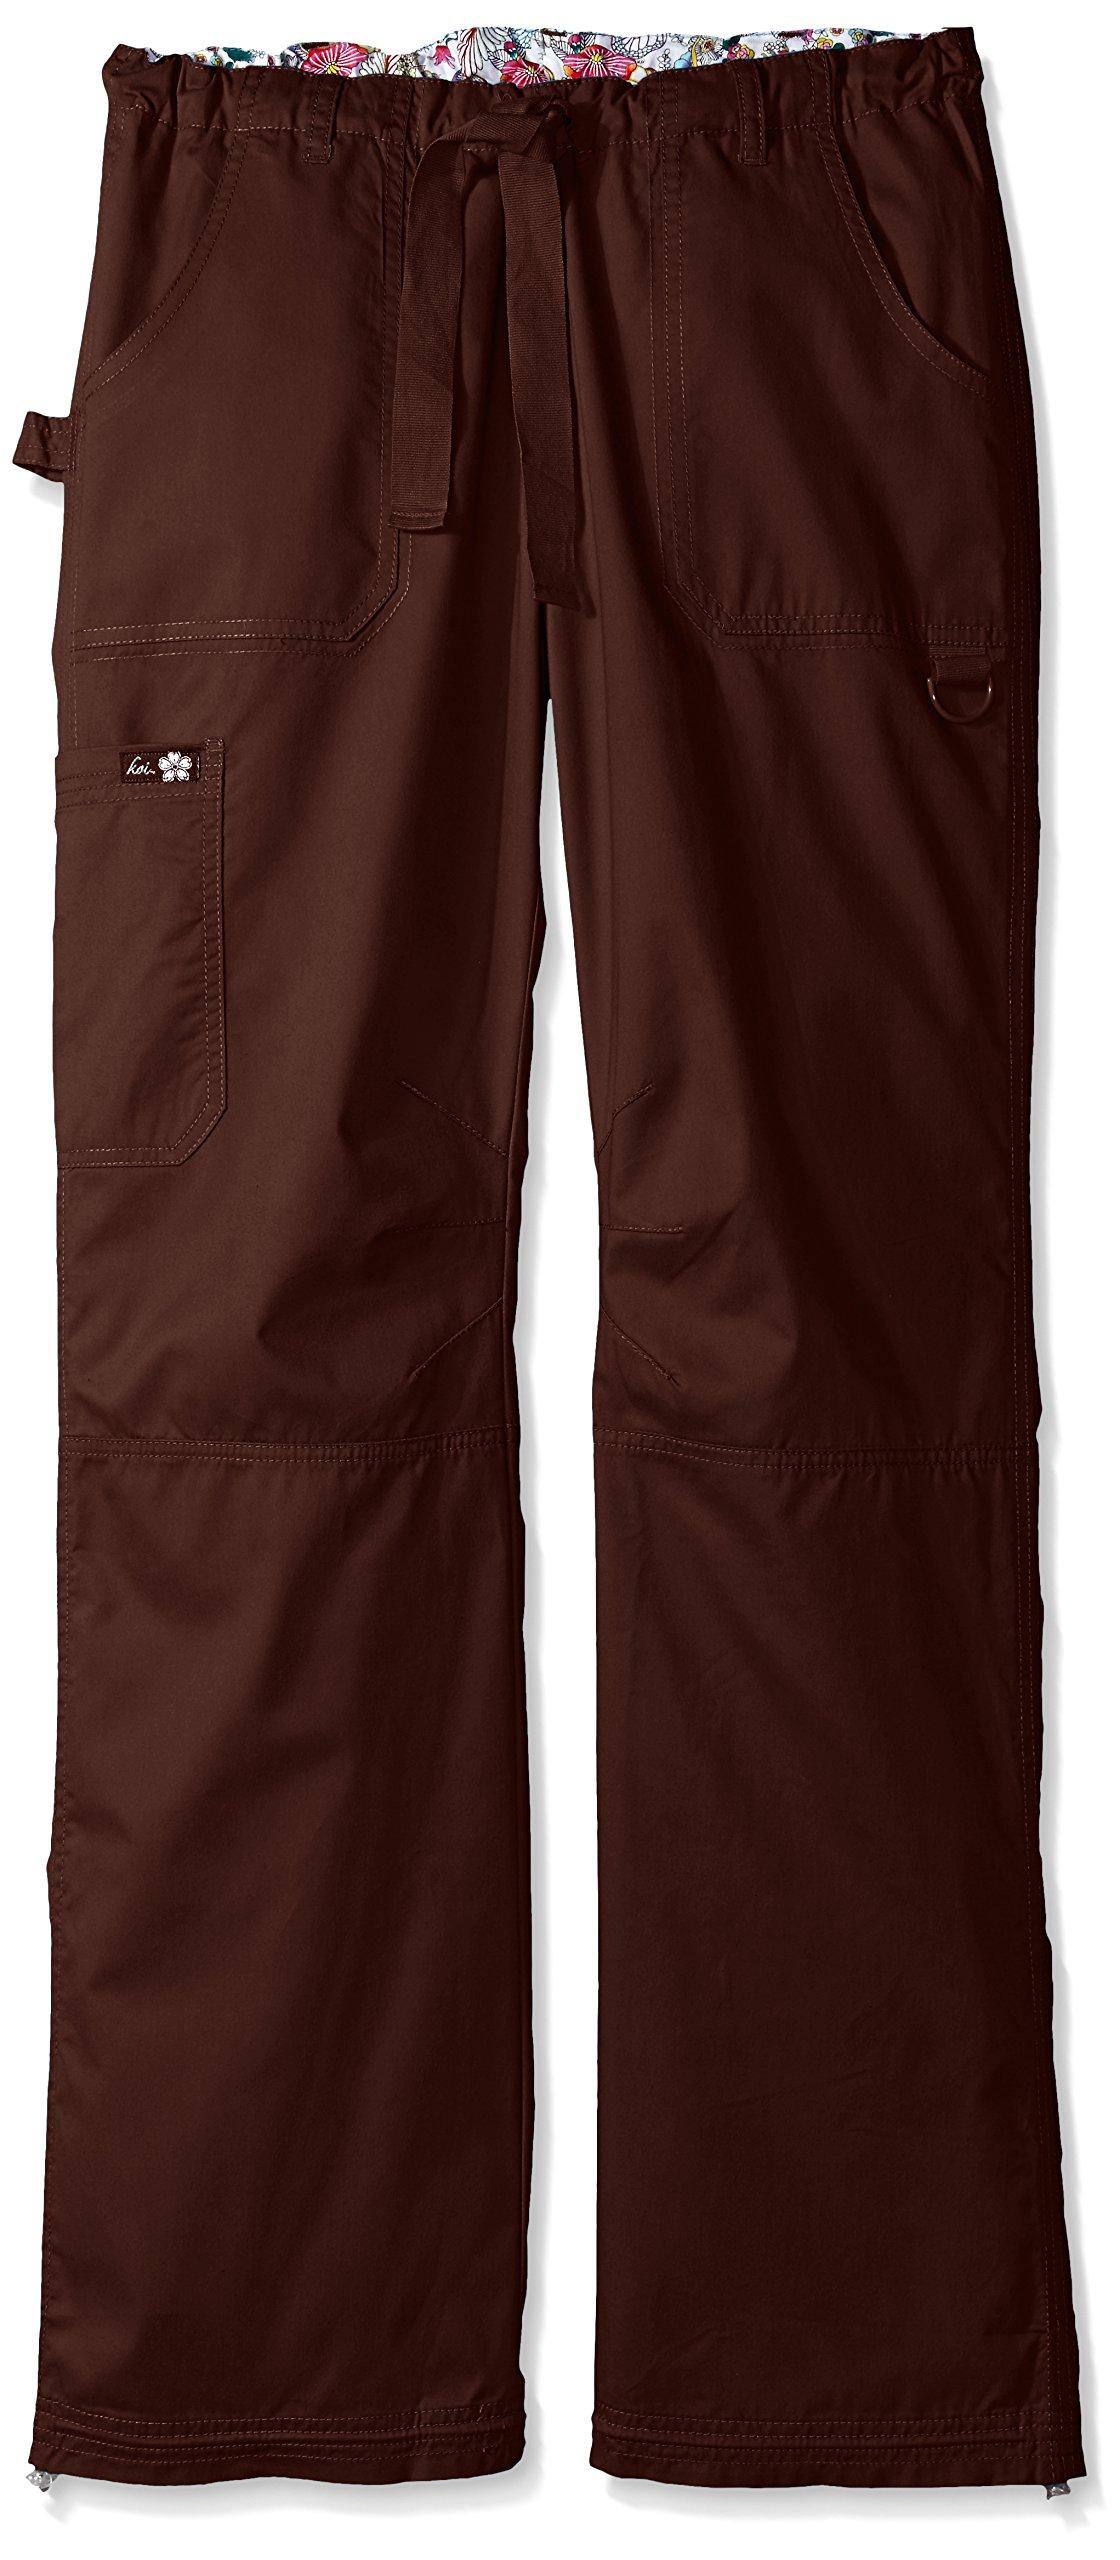 KOI Women's Tall Lindsey Ultra Comfortable Cargo Style Scrub Pants Sizes, Espresso, Medium/Tall